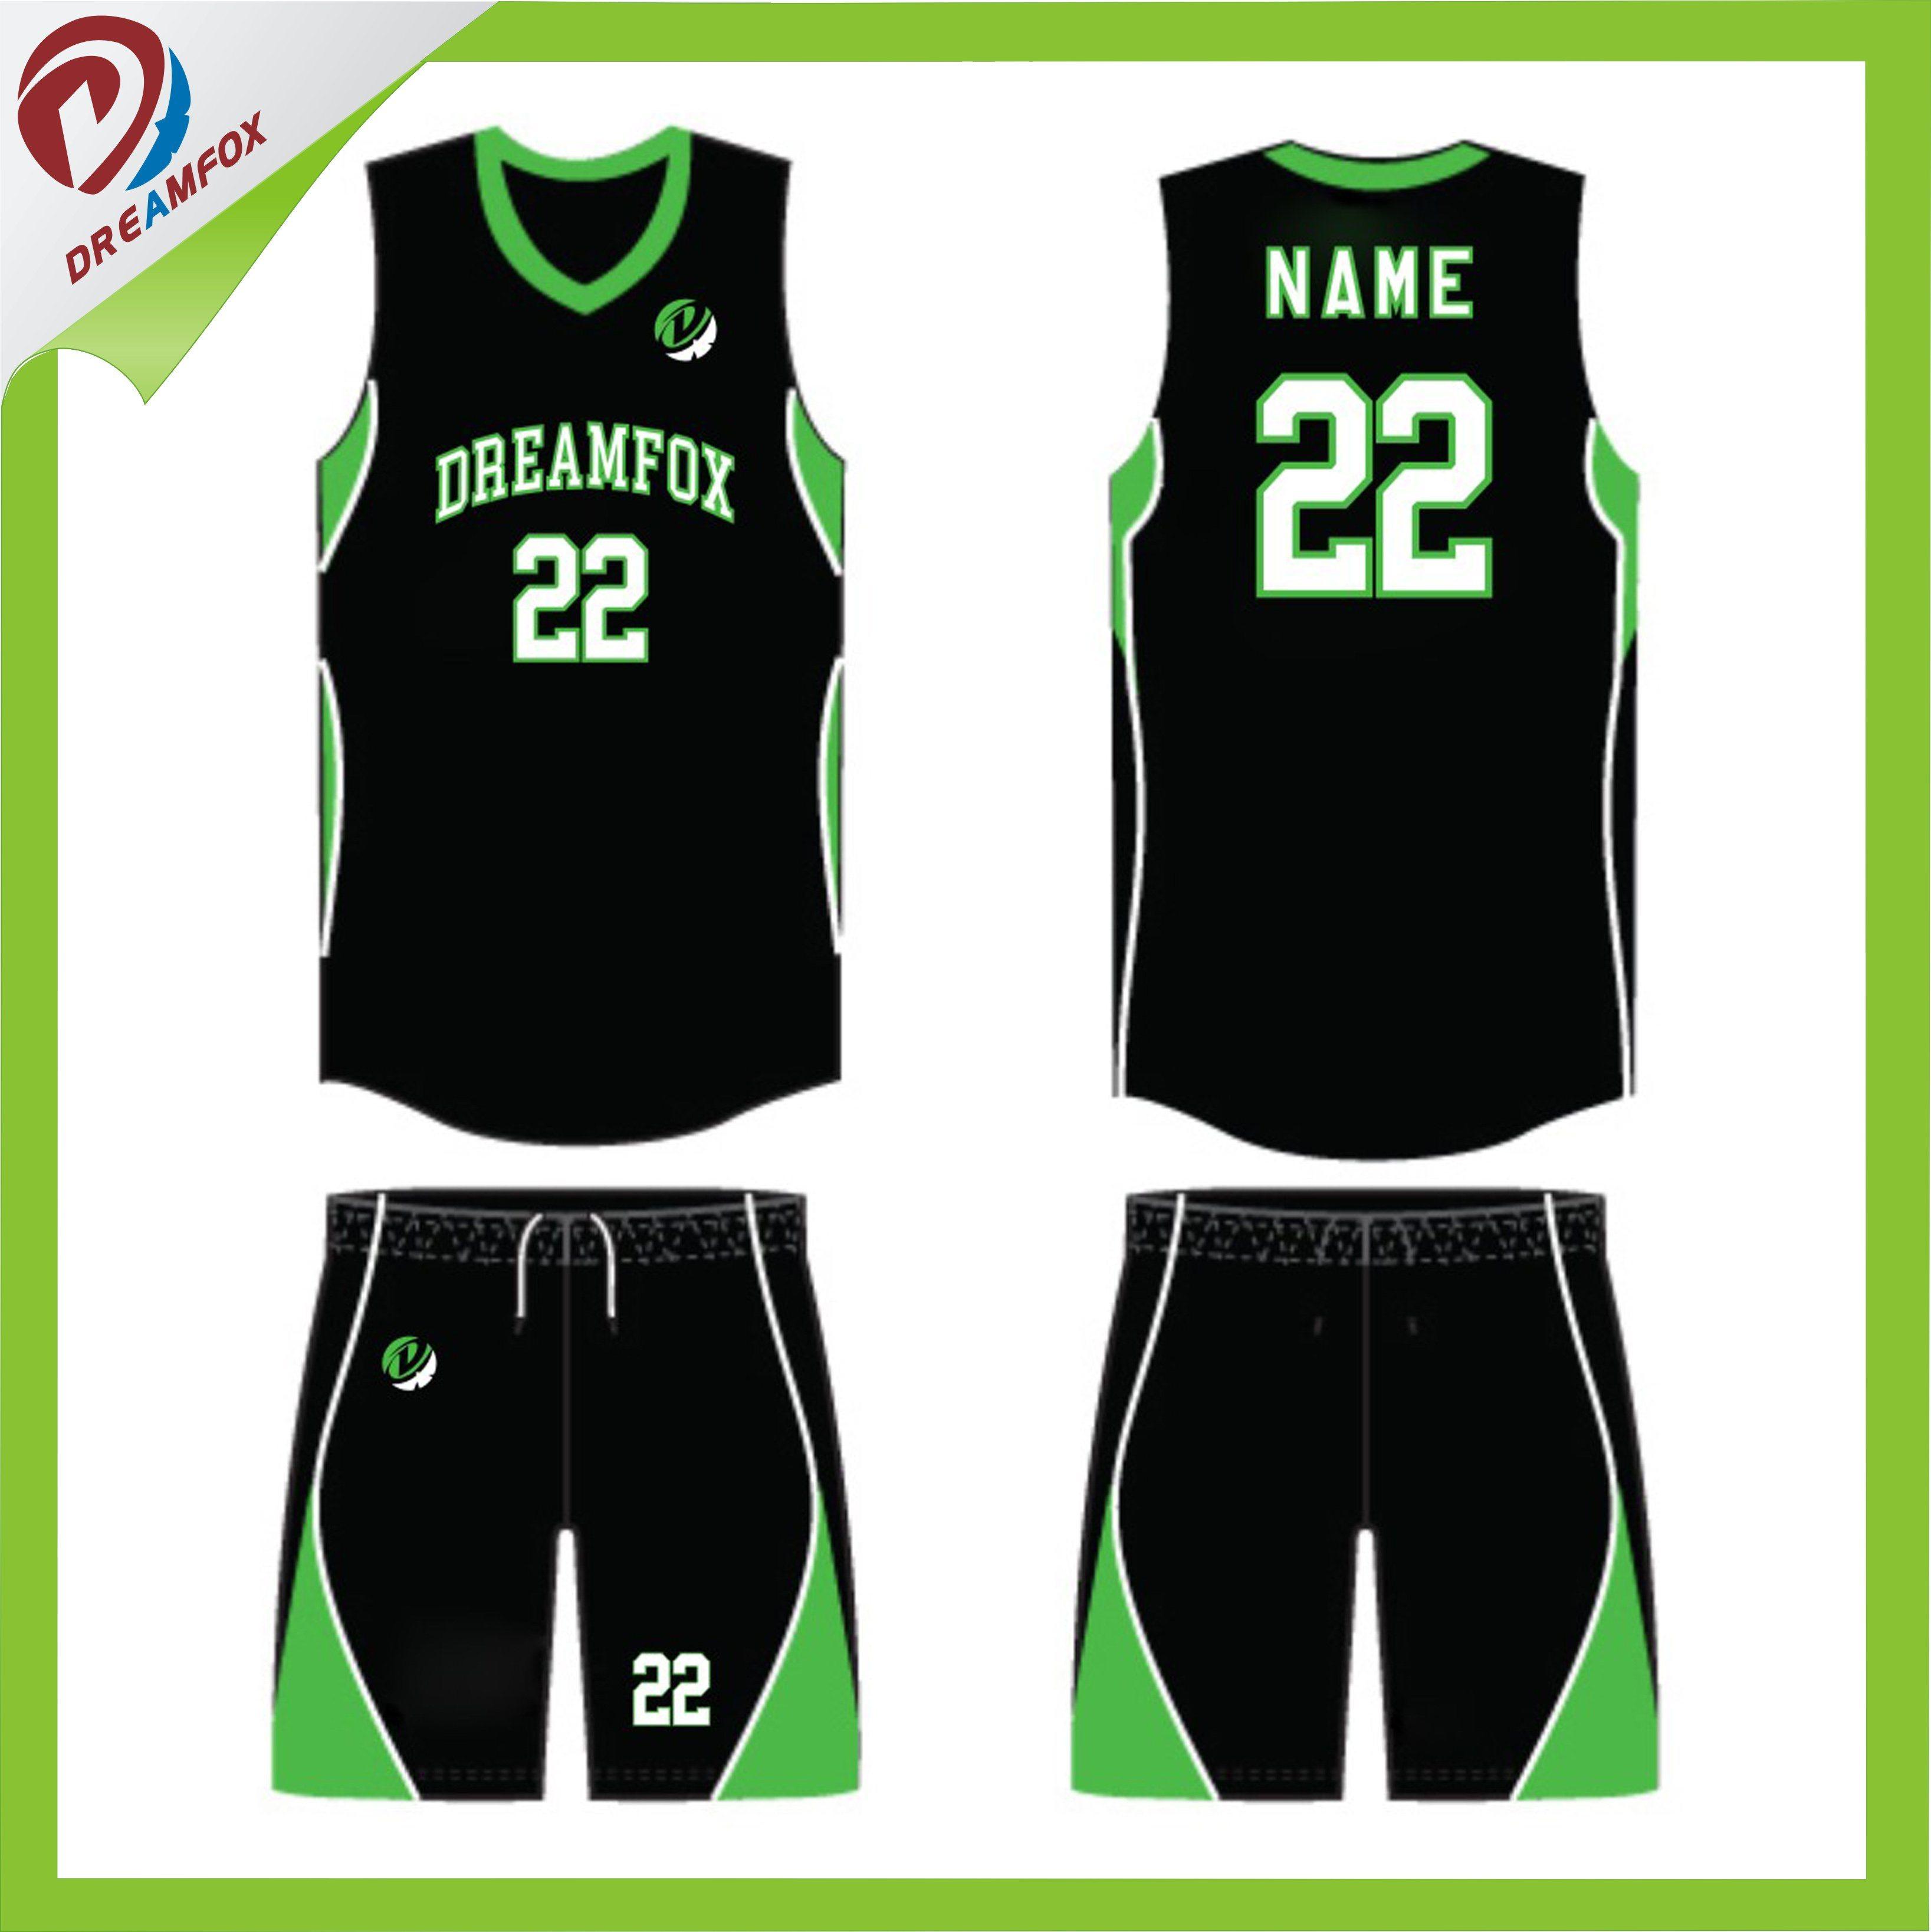 cf97f5e09b0 China Wholesales New Design Sublimation Custom Basketball Jersey Uniform  Design - China Custom Basketball Jersey Uniform Design